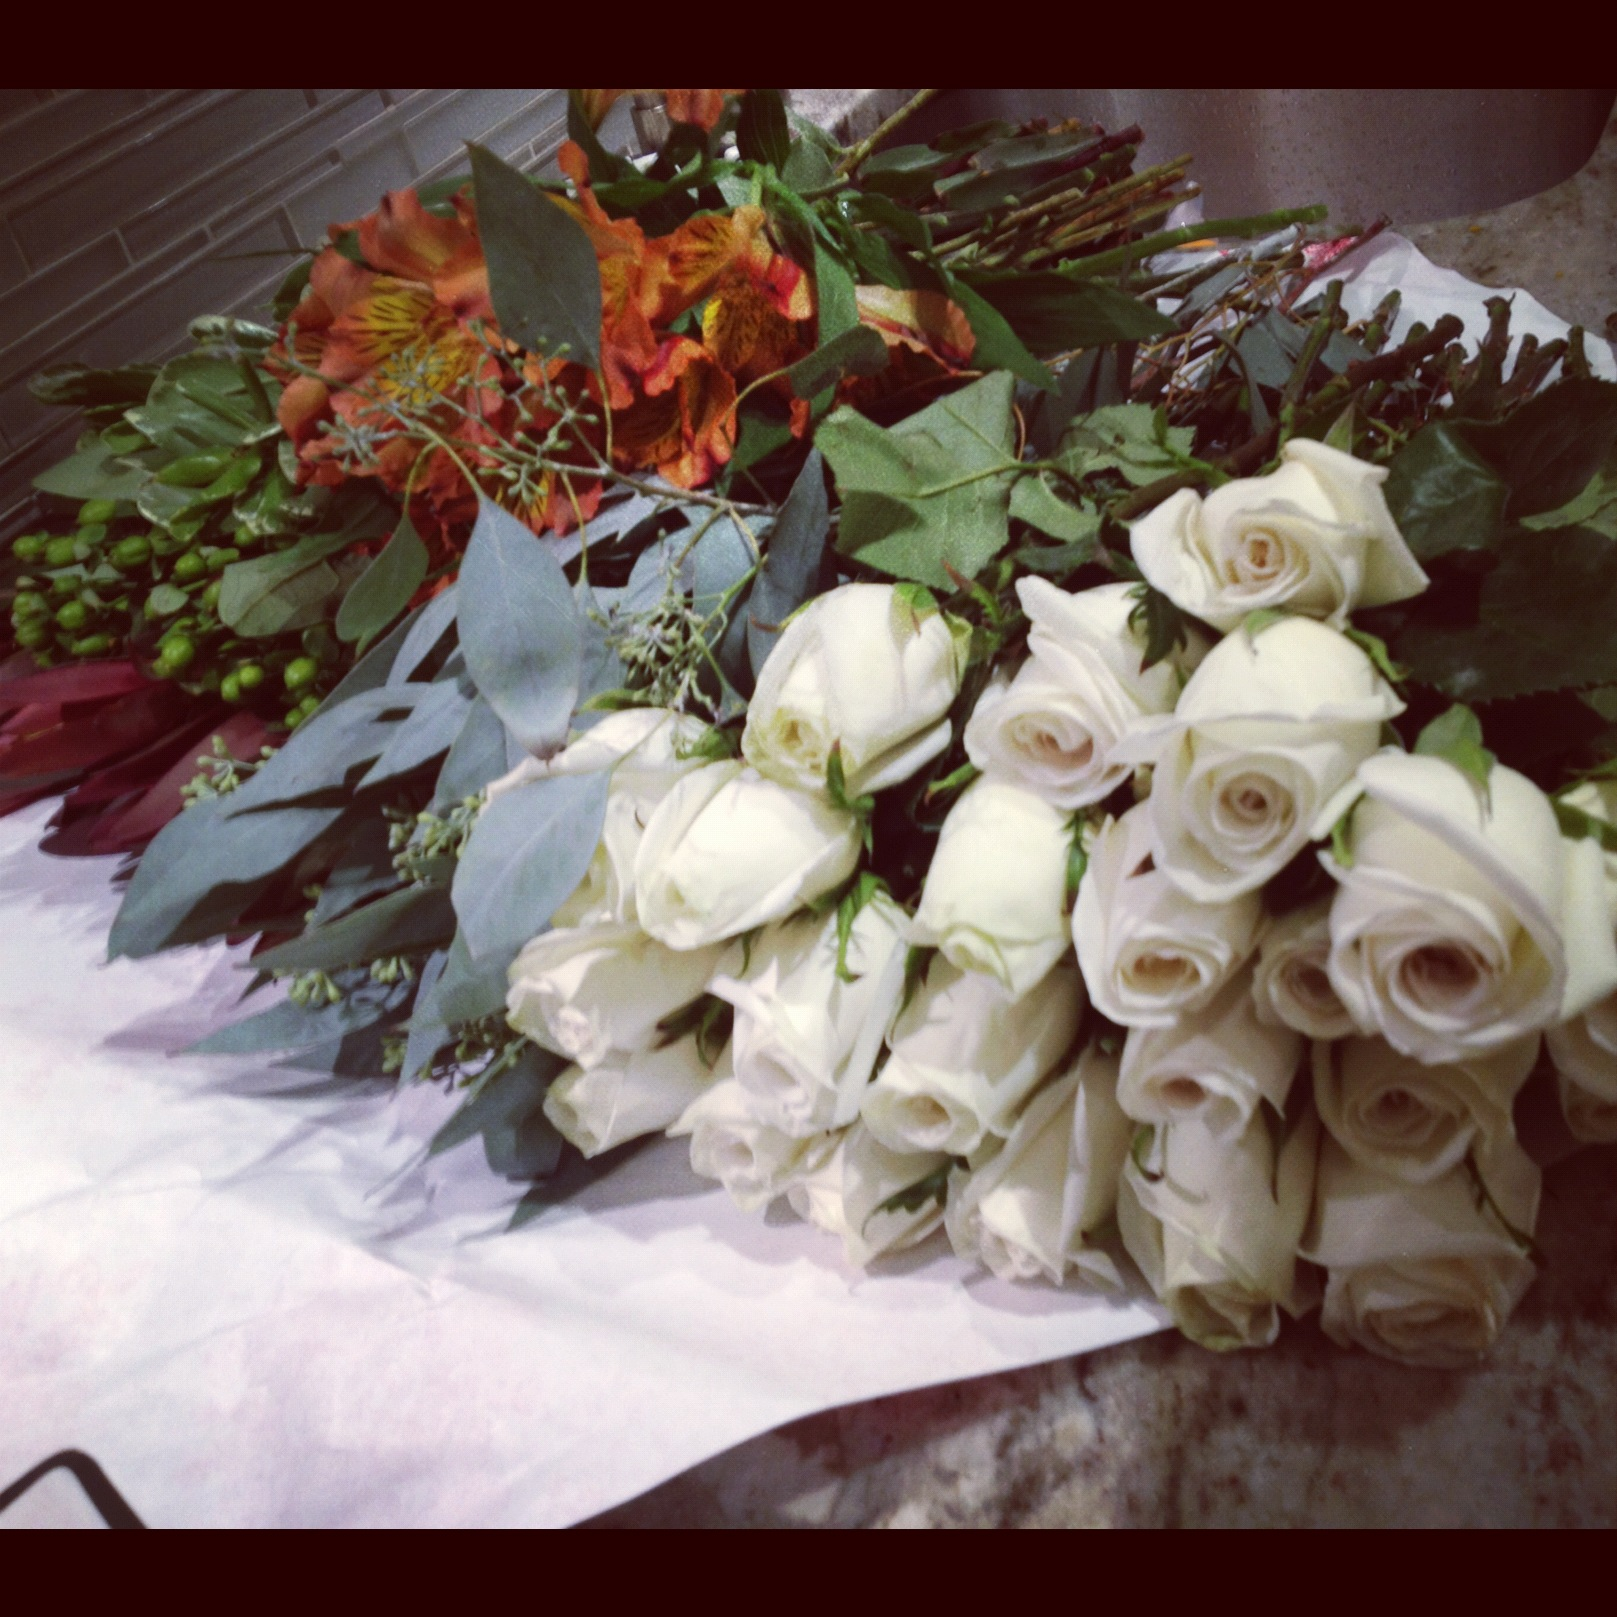 Diy fall flowers how to make 35 flowers look like 120 fall wedding party flowers diy tutorial mightylinksfo